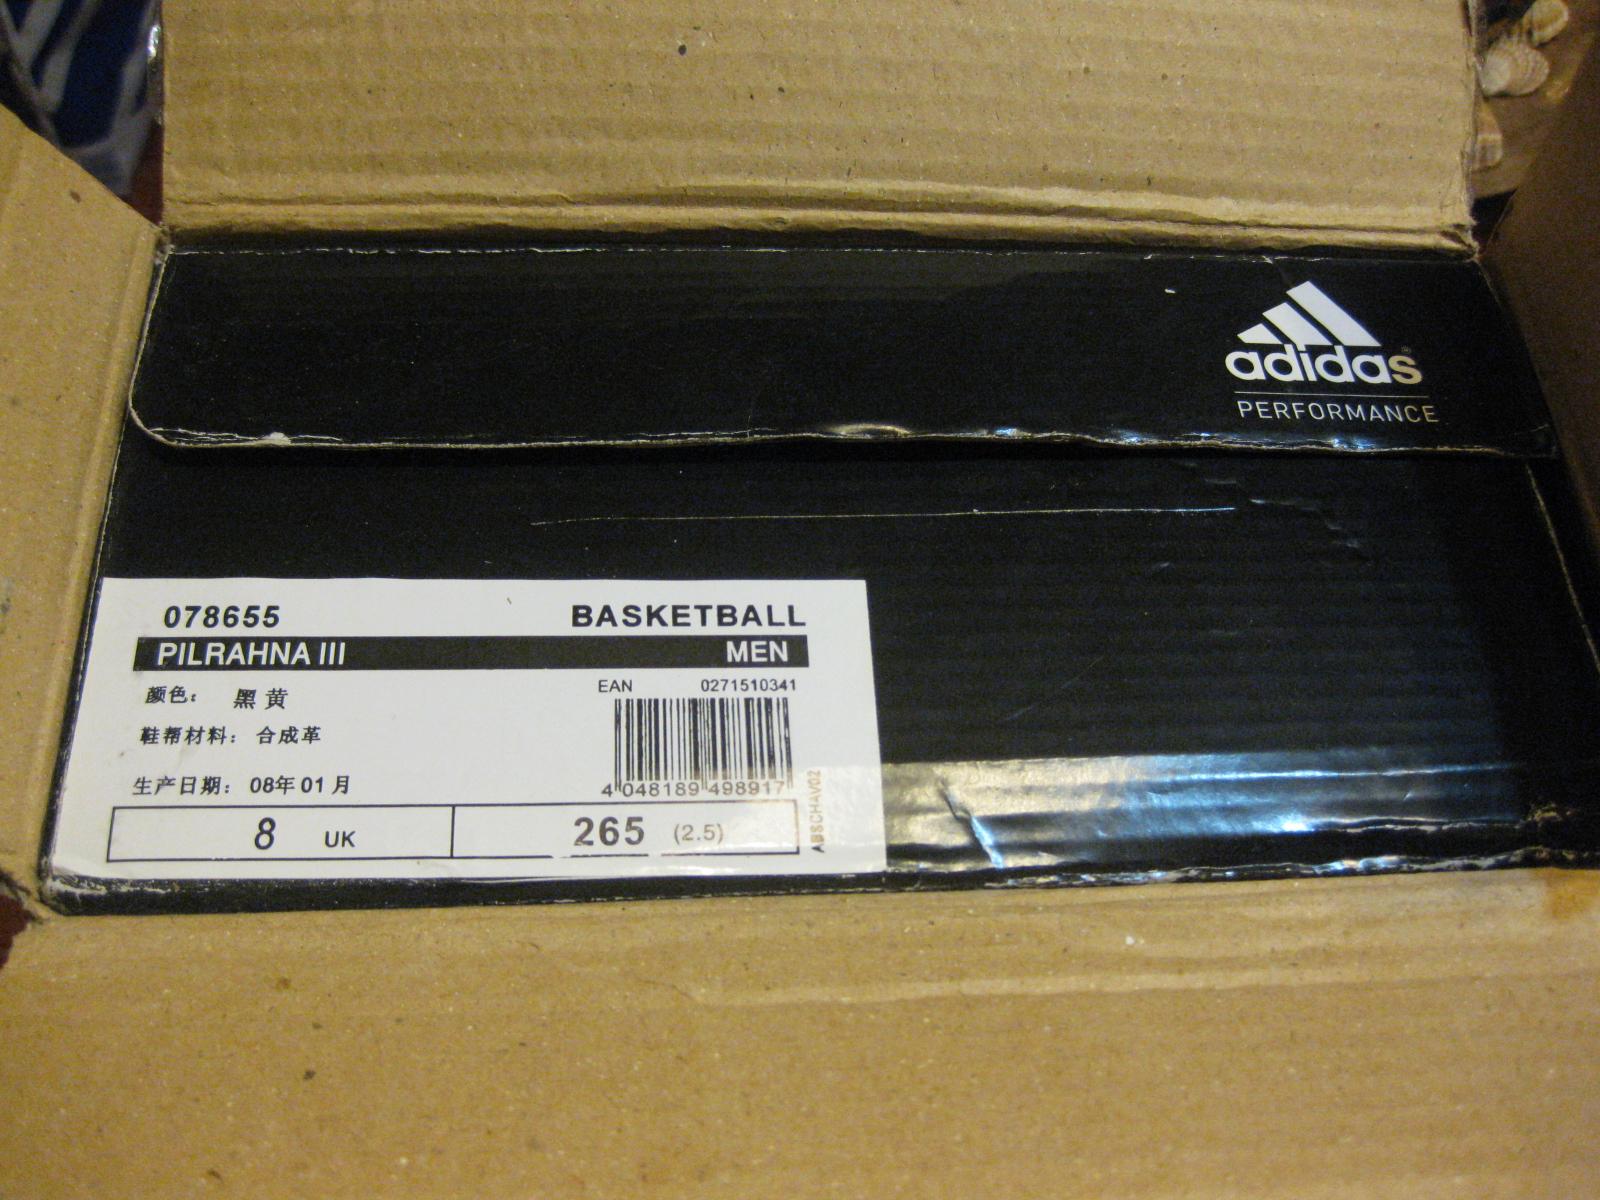 3 0 Review Adidas Sportlord Pilranha Las De Análisis xvTqTwXSF